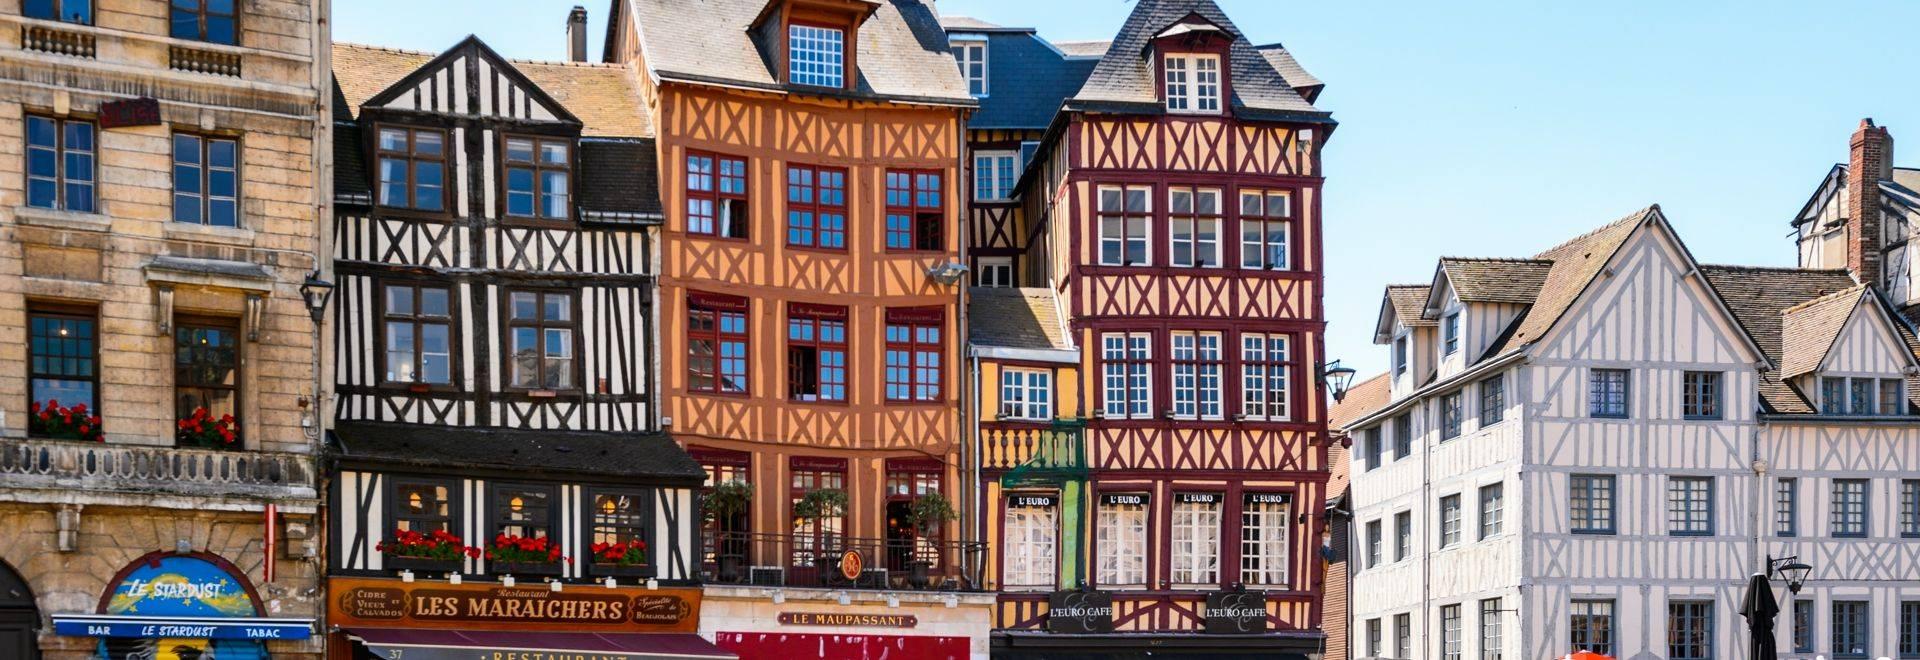 Shutterstock 294202151 Architecture Of Joan'S D'Arc Square In Rouen 1